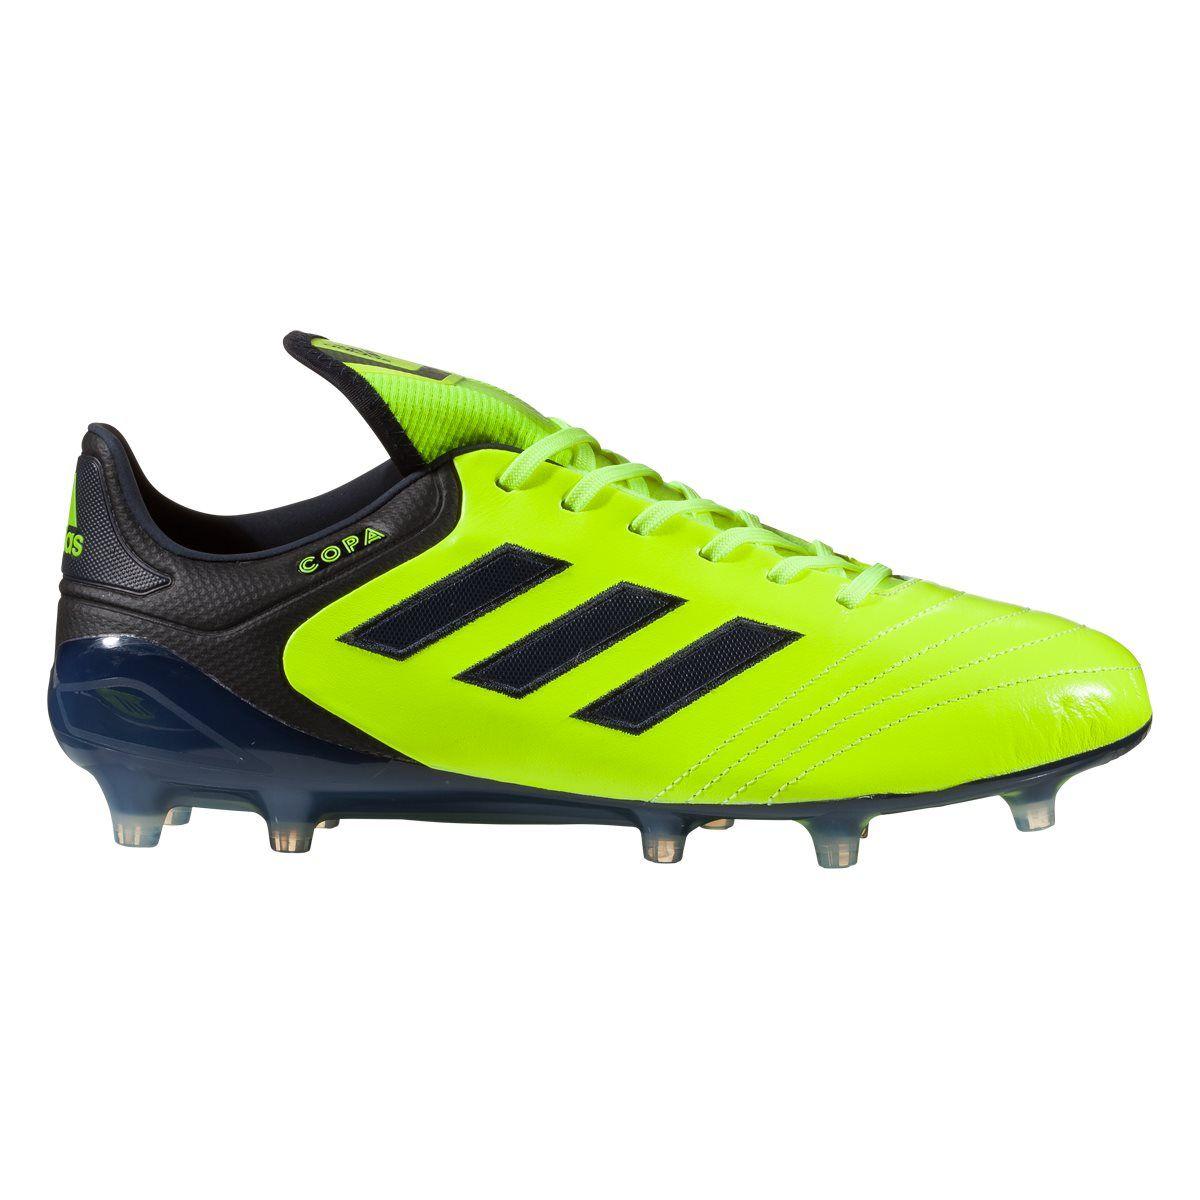 best sneakers 6dd89 daa6f adidas Ocean Storm Pack   adidas Copa 17.1 FG Soccer Cleats